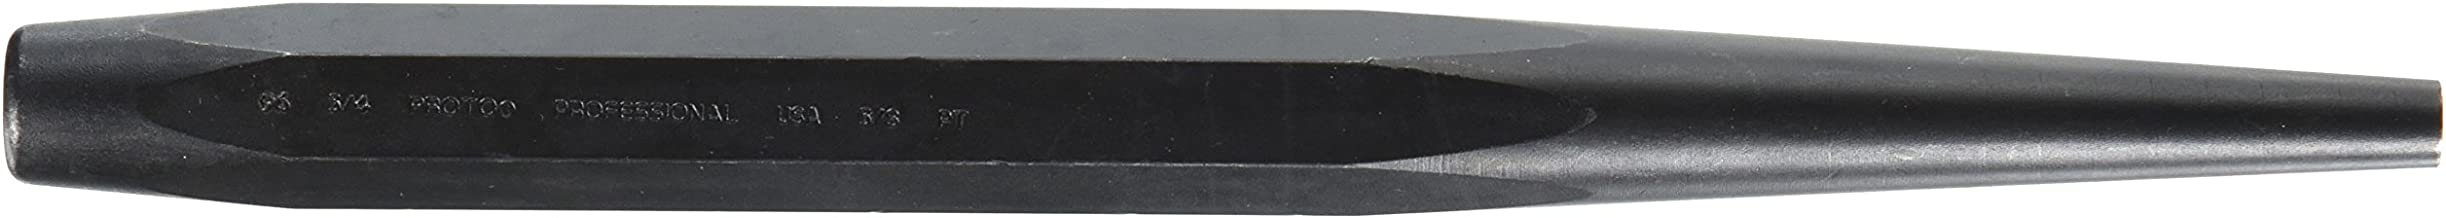 Stanley Proto J963/4 Proto 3/4-Inch Hex X 3/8-Inch Drift Punch